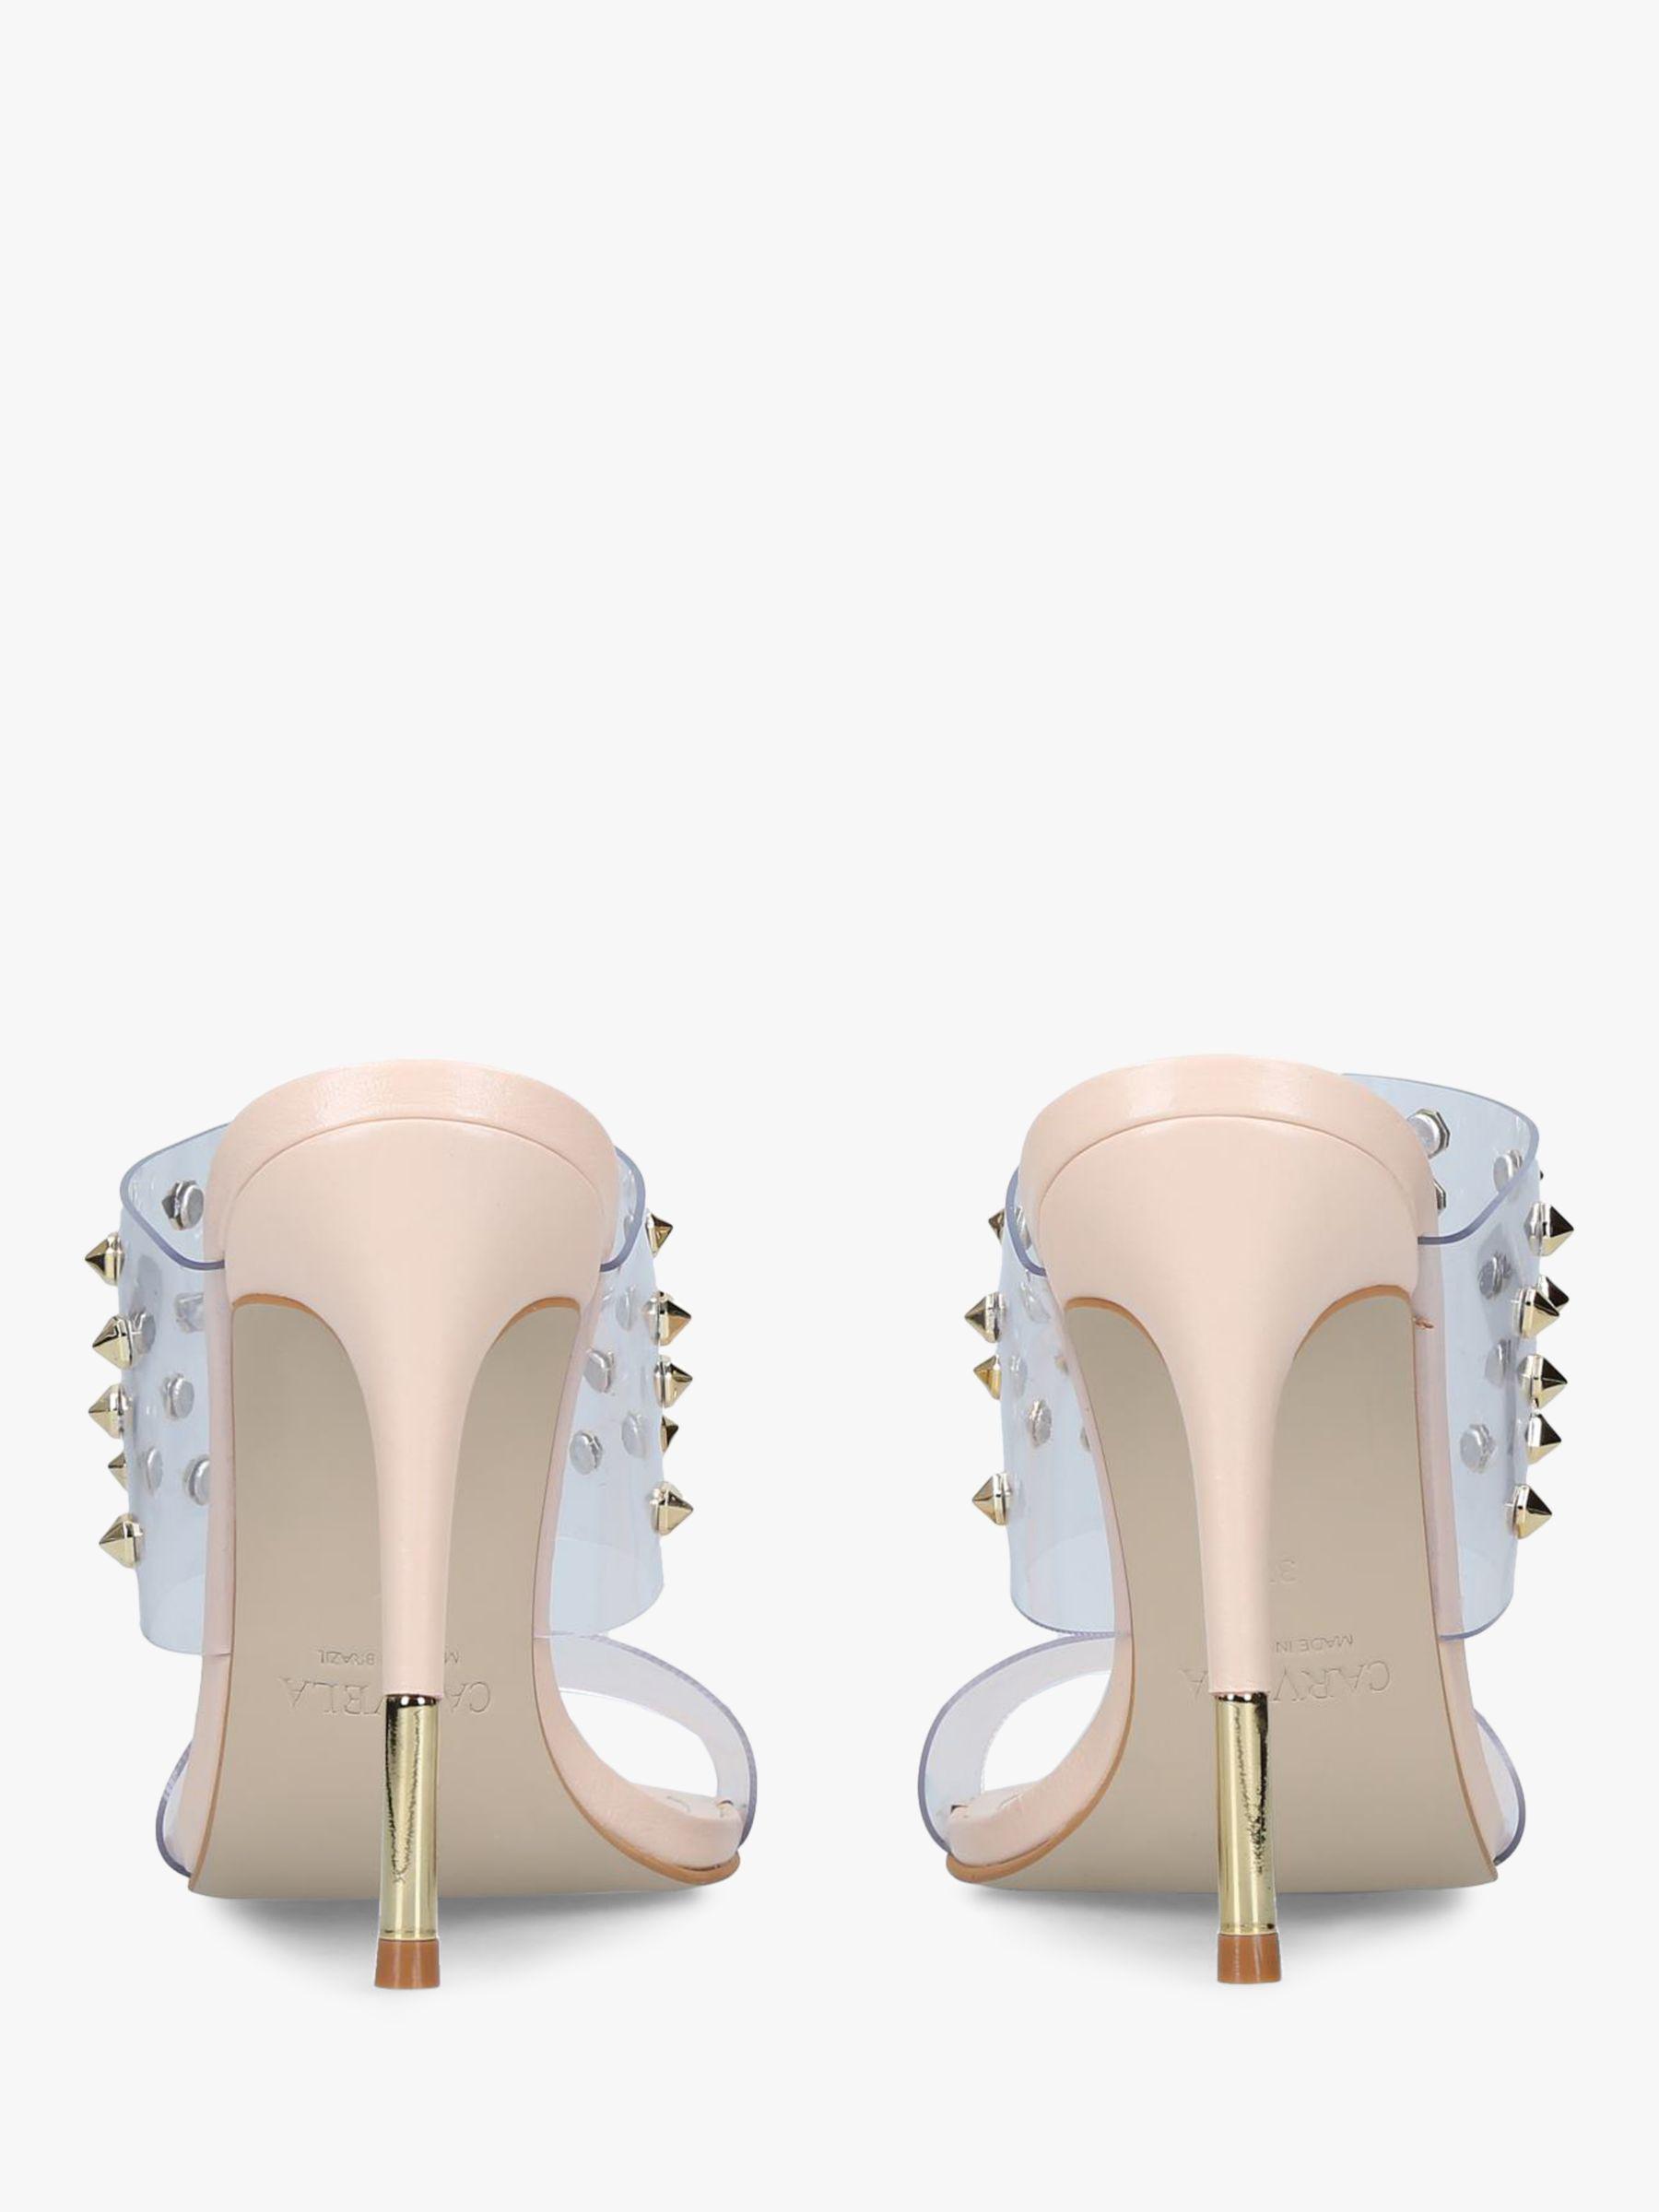 9ed3de9d1 Carvela Kurt Geiger Ghost Studded Stiletto Heel Sandals in Natural ...